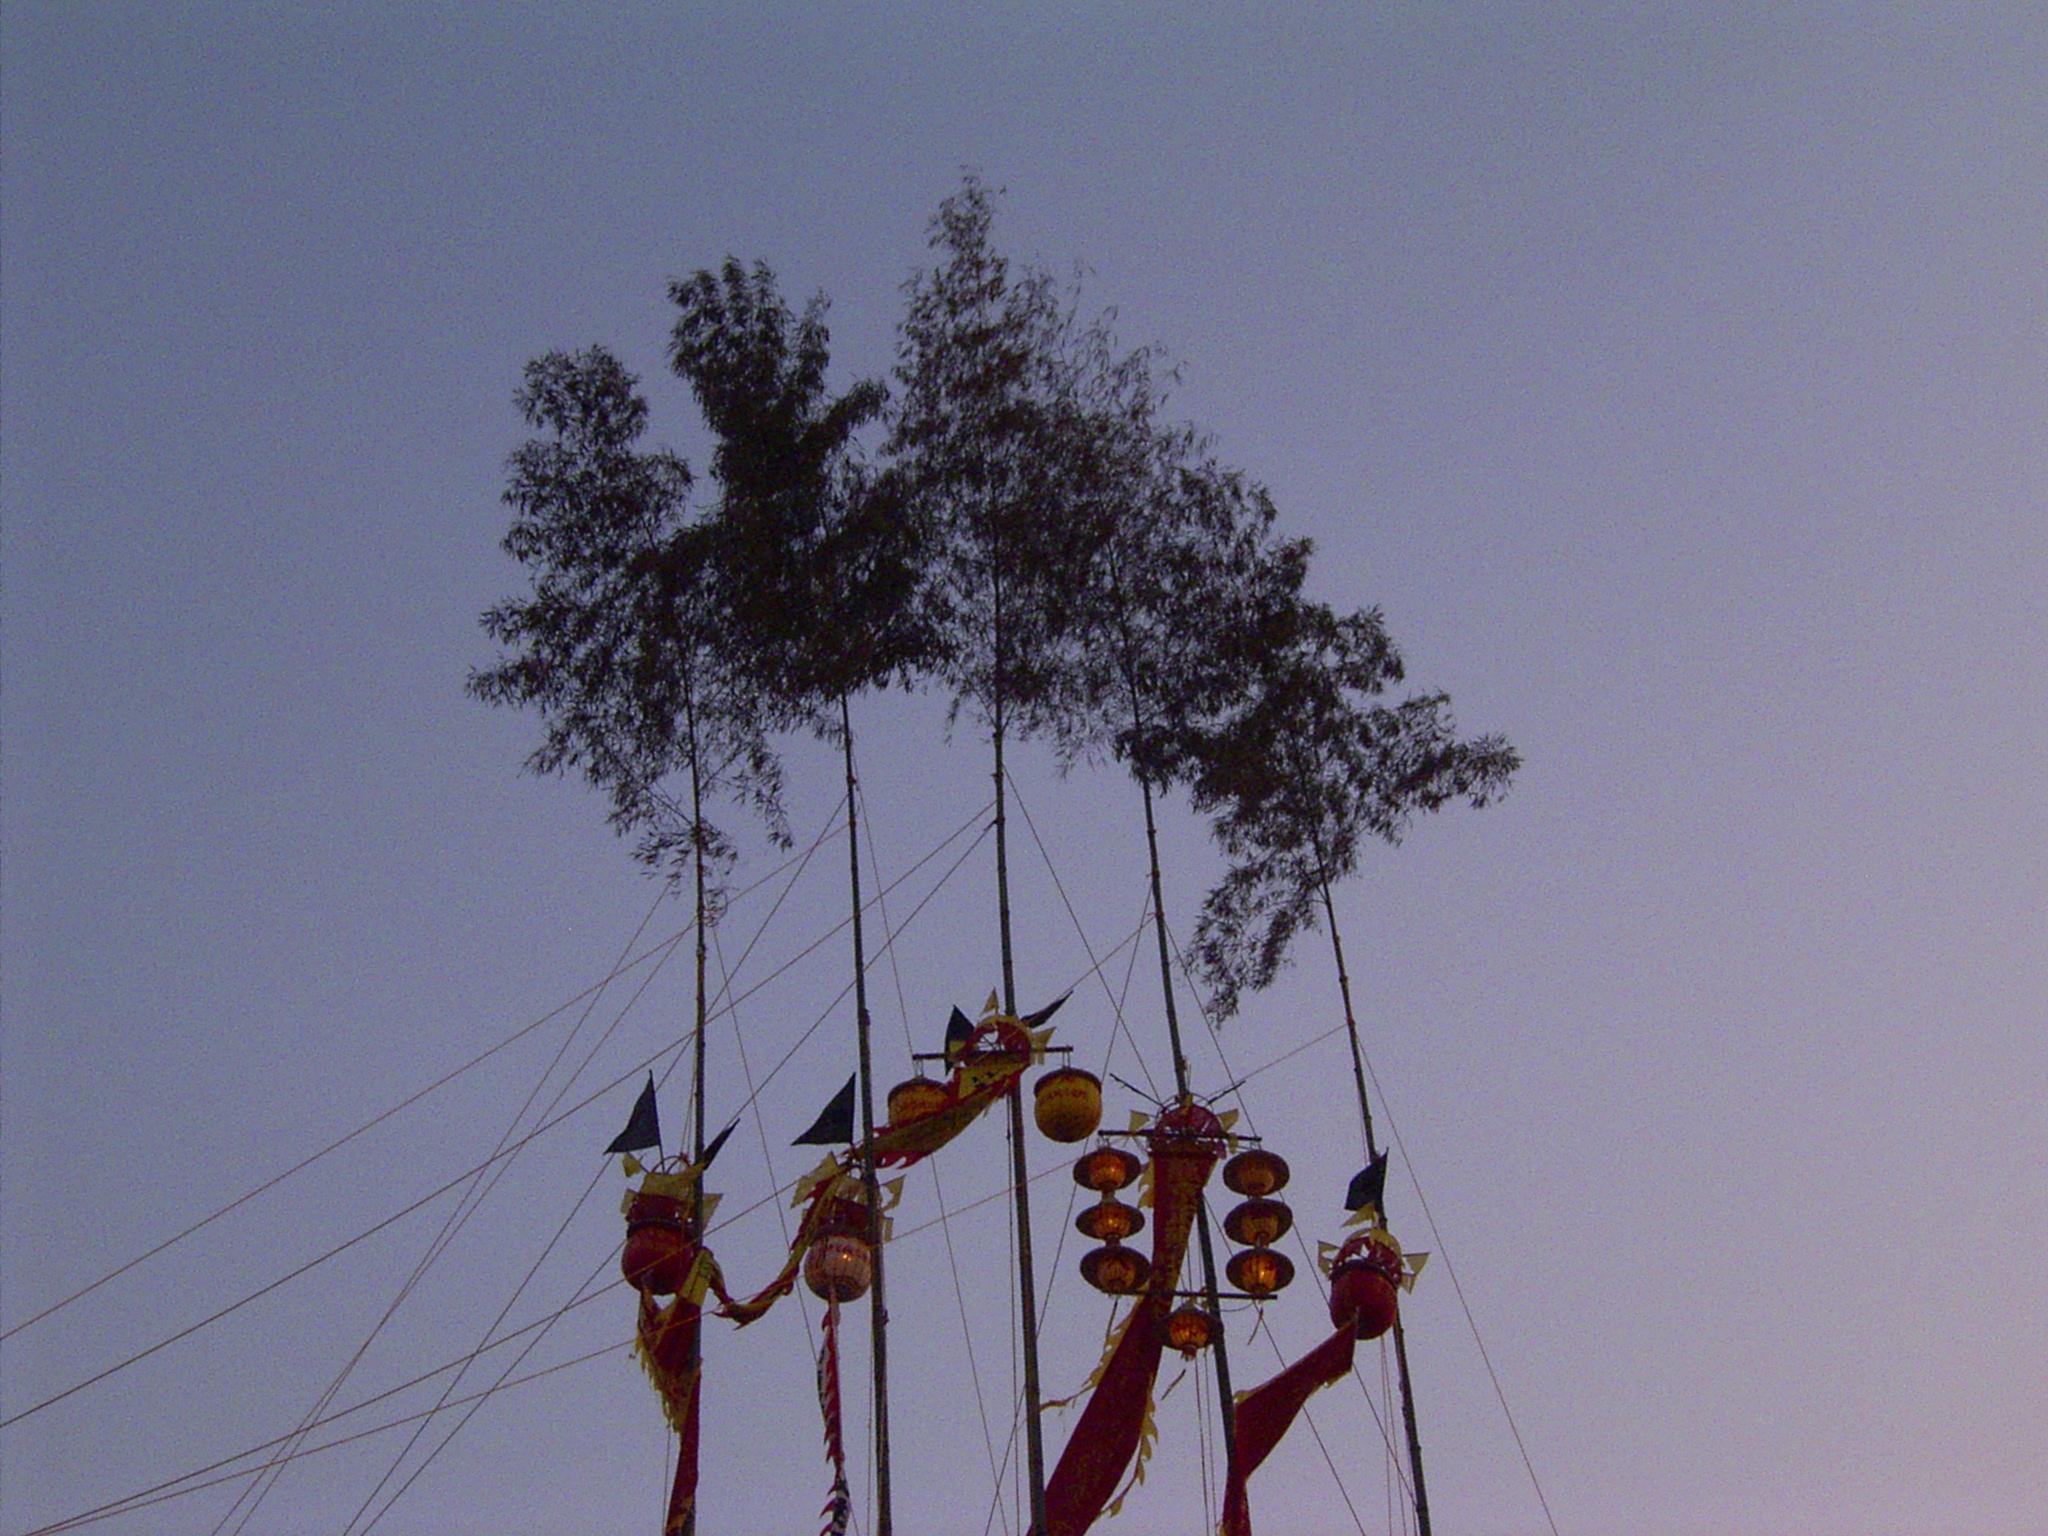 https://globalvoicesonline.org/wp-content/uploads/2008/11/bamboo.jpg